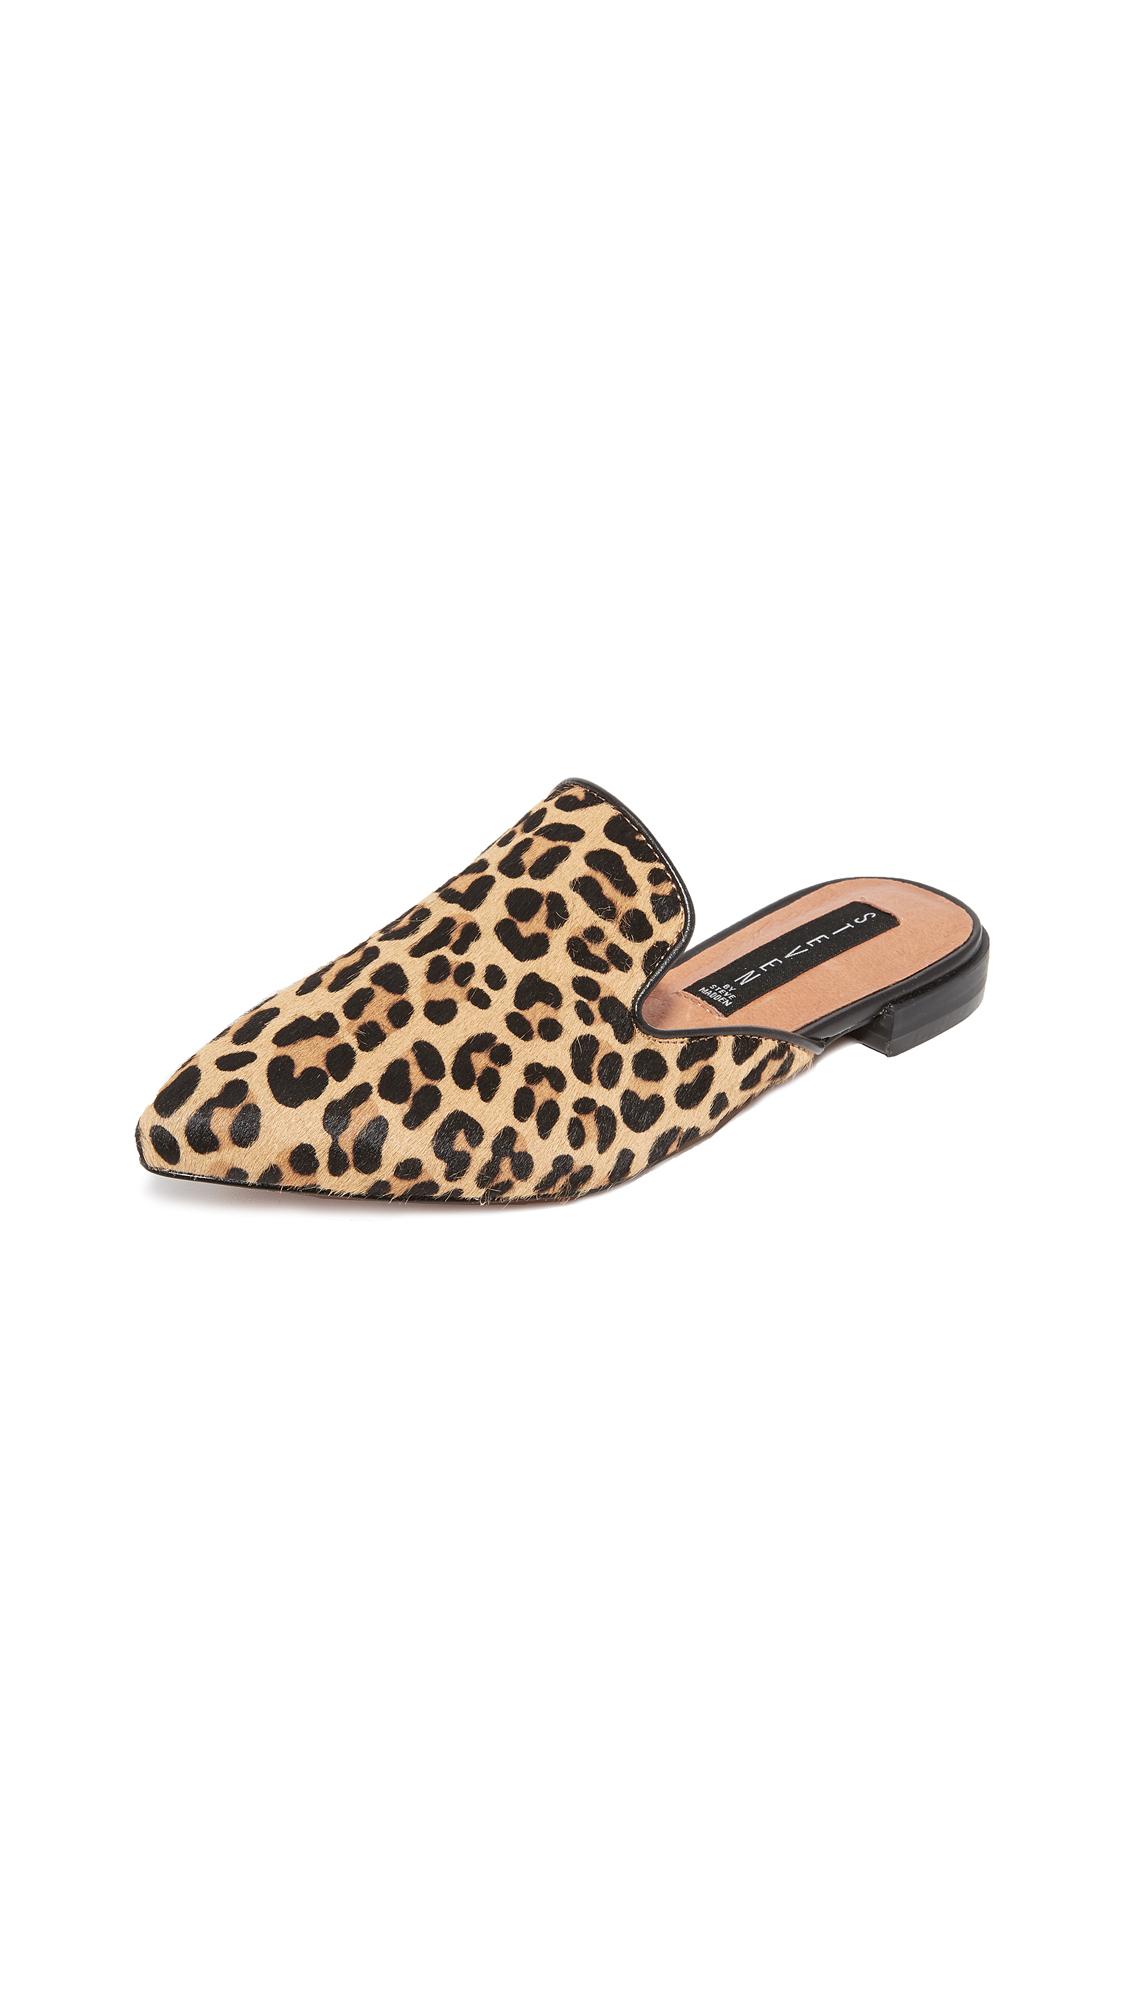 Steven Valente Leopard Mules - Leopard